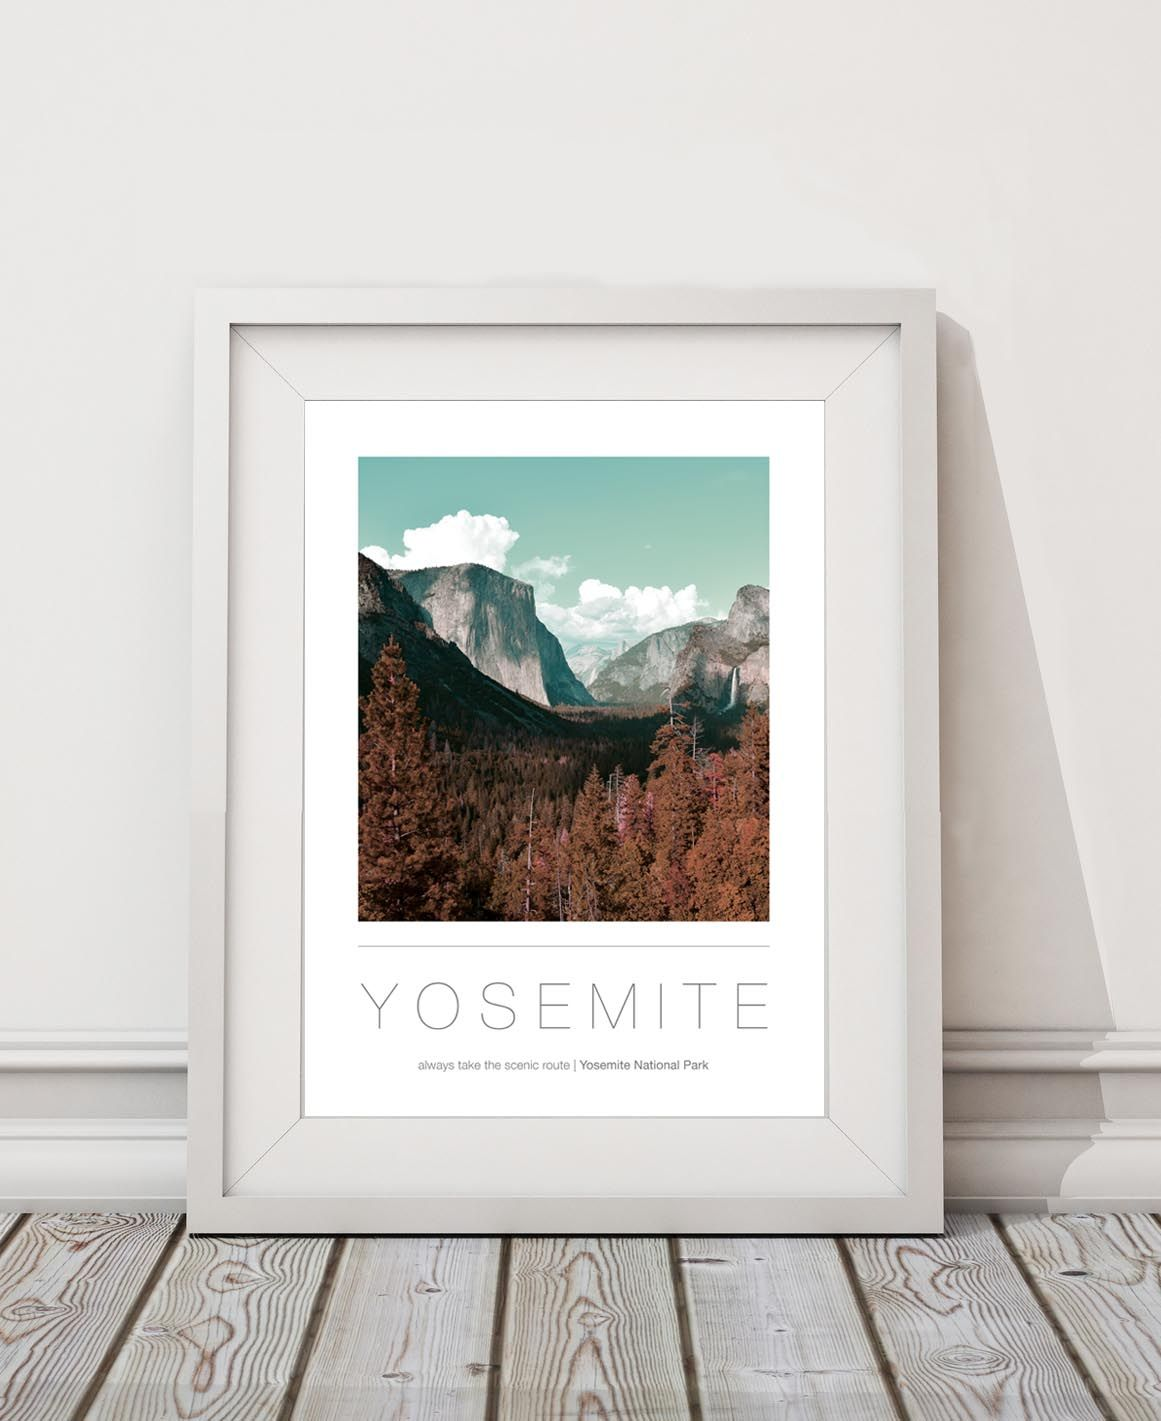 Yosemite National Park A3 / A2 Destination Poster